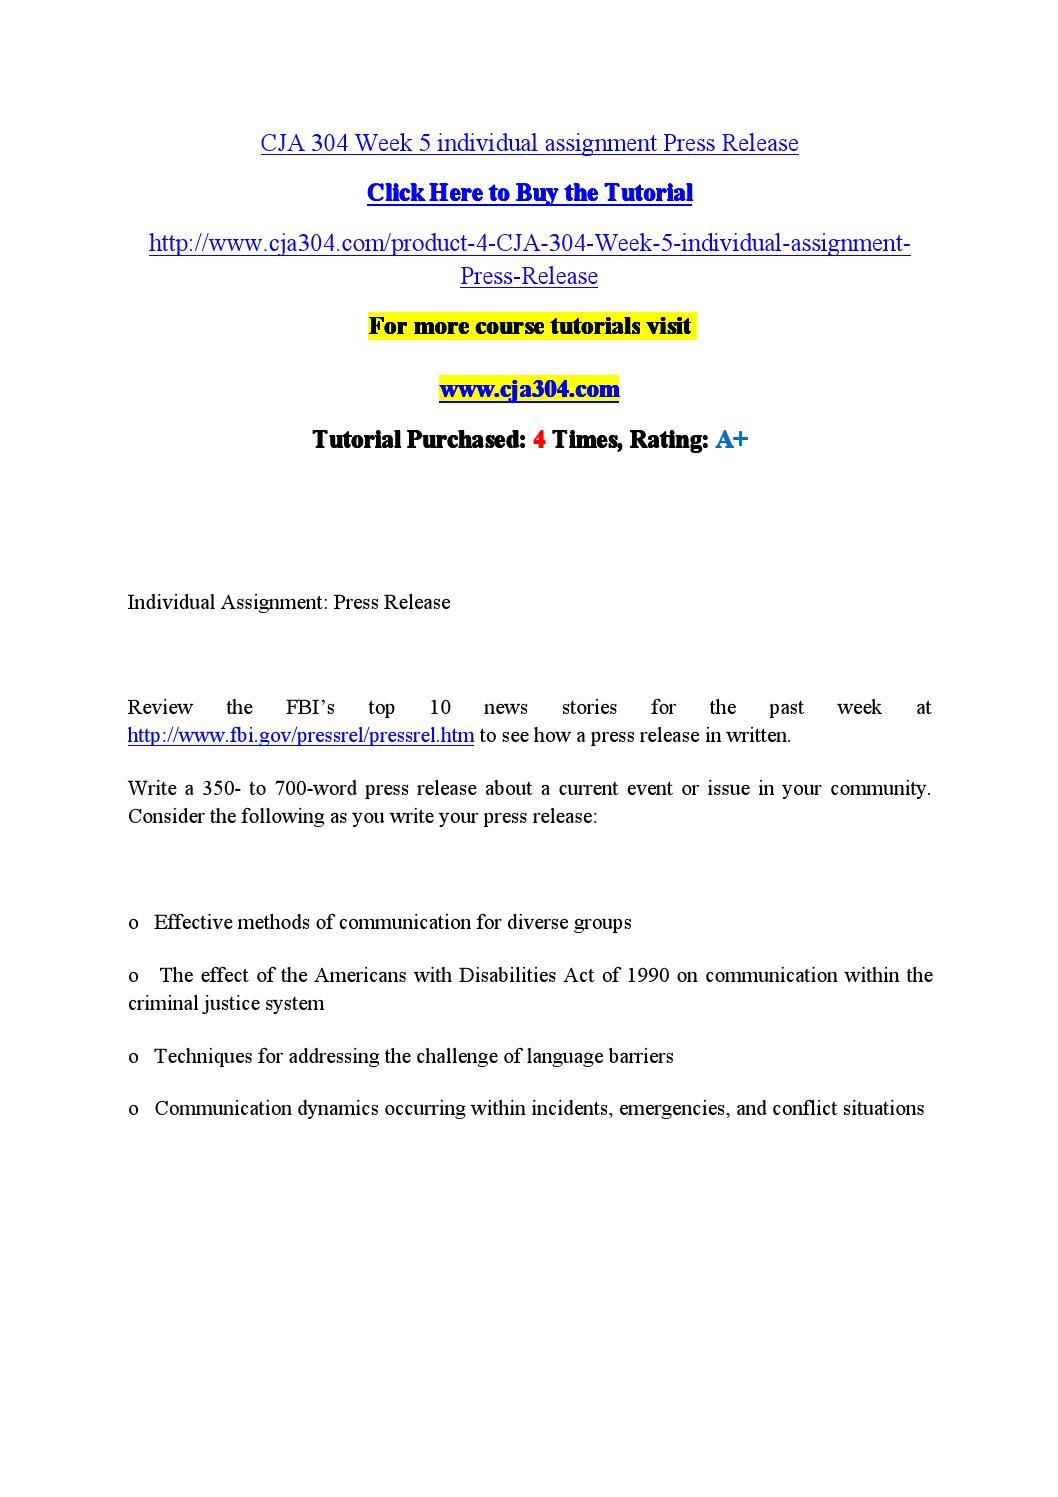 cja 304 acquiring admissible statements worksheet Cja 304 week 3 complete acquiring admissible statements worksheet complete the acquiring admissible statements worksheet located on bestcustomessays.